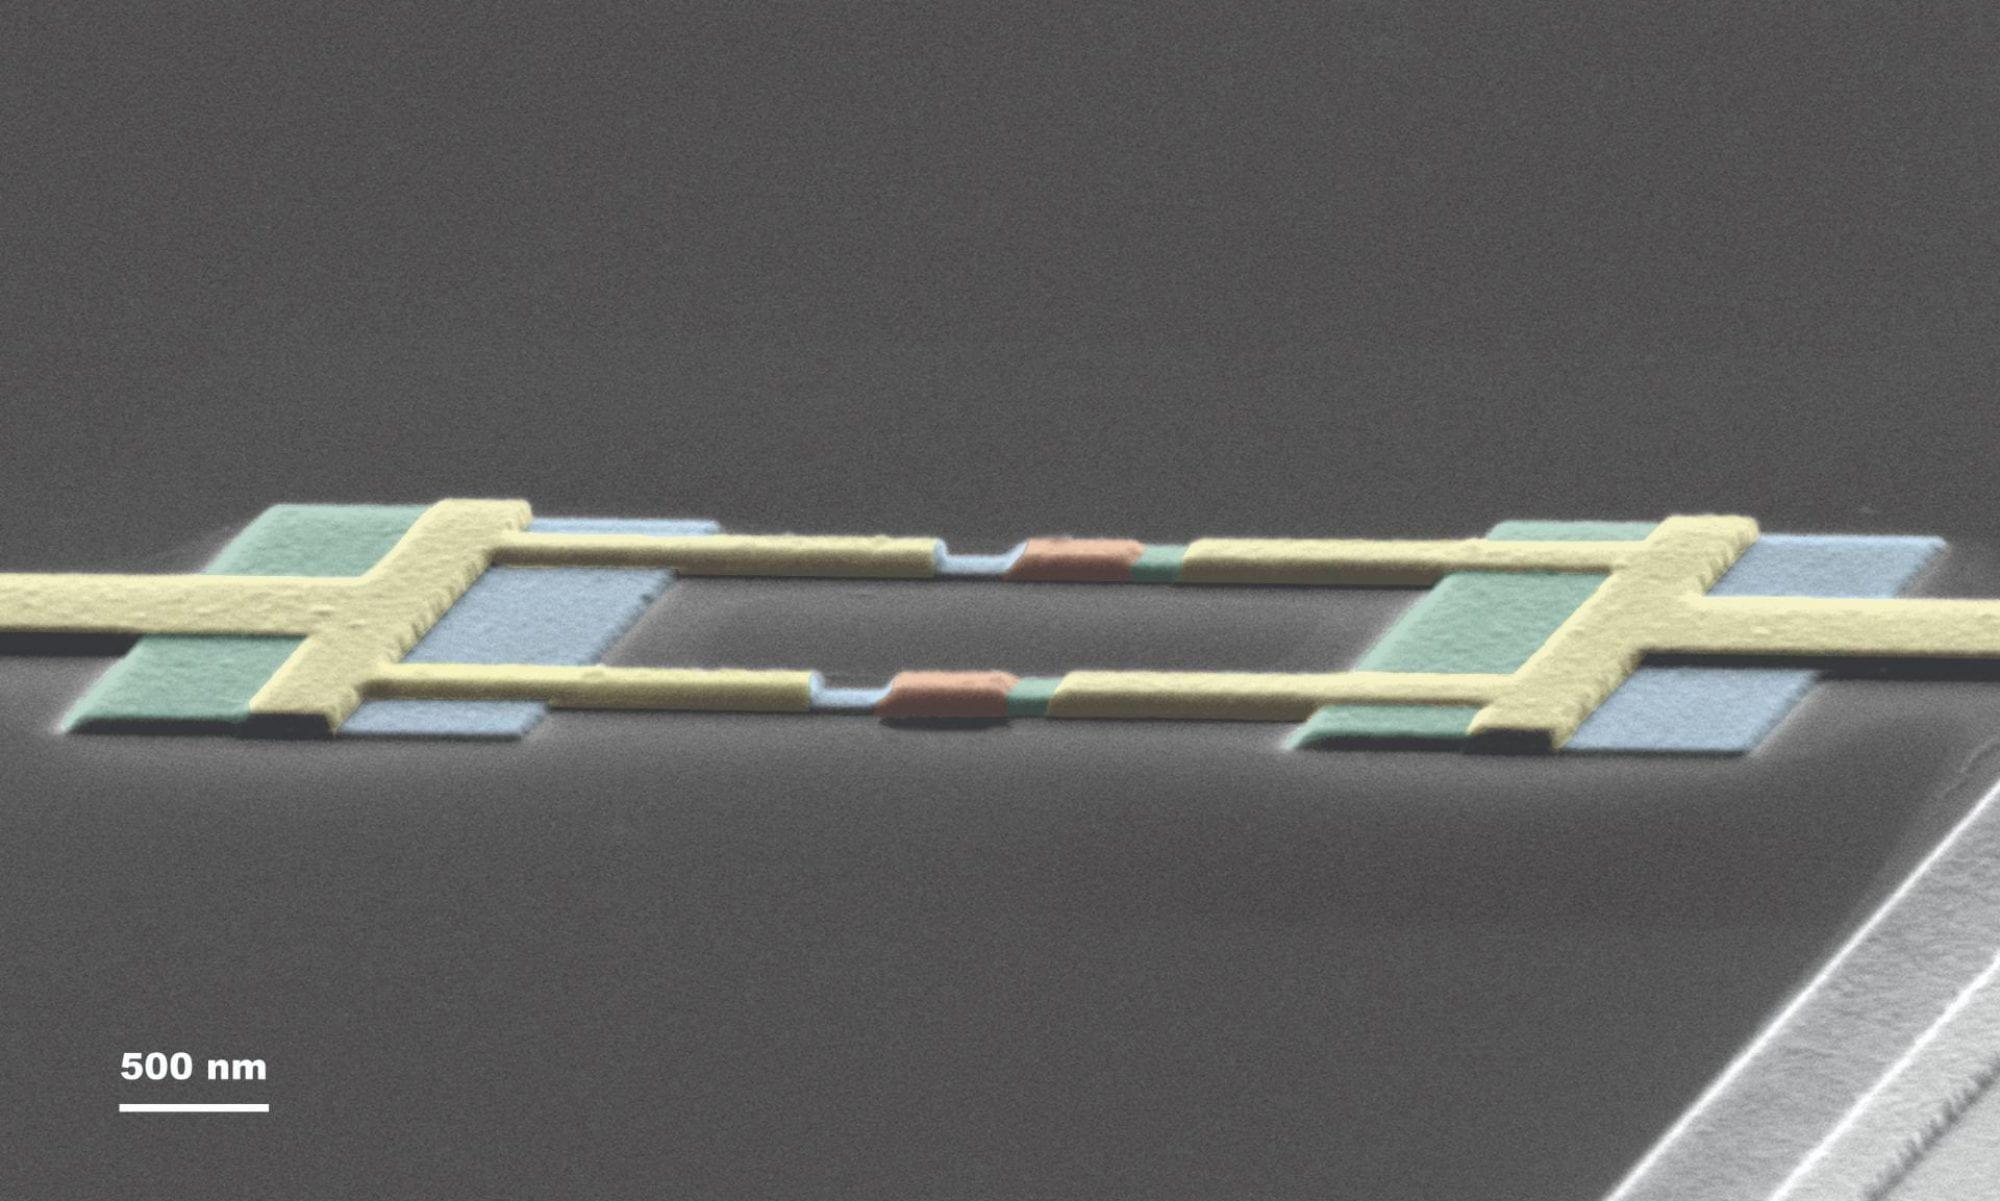 USC Core Nanofabrication Facilities